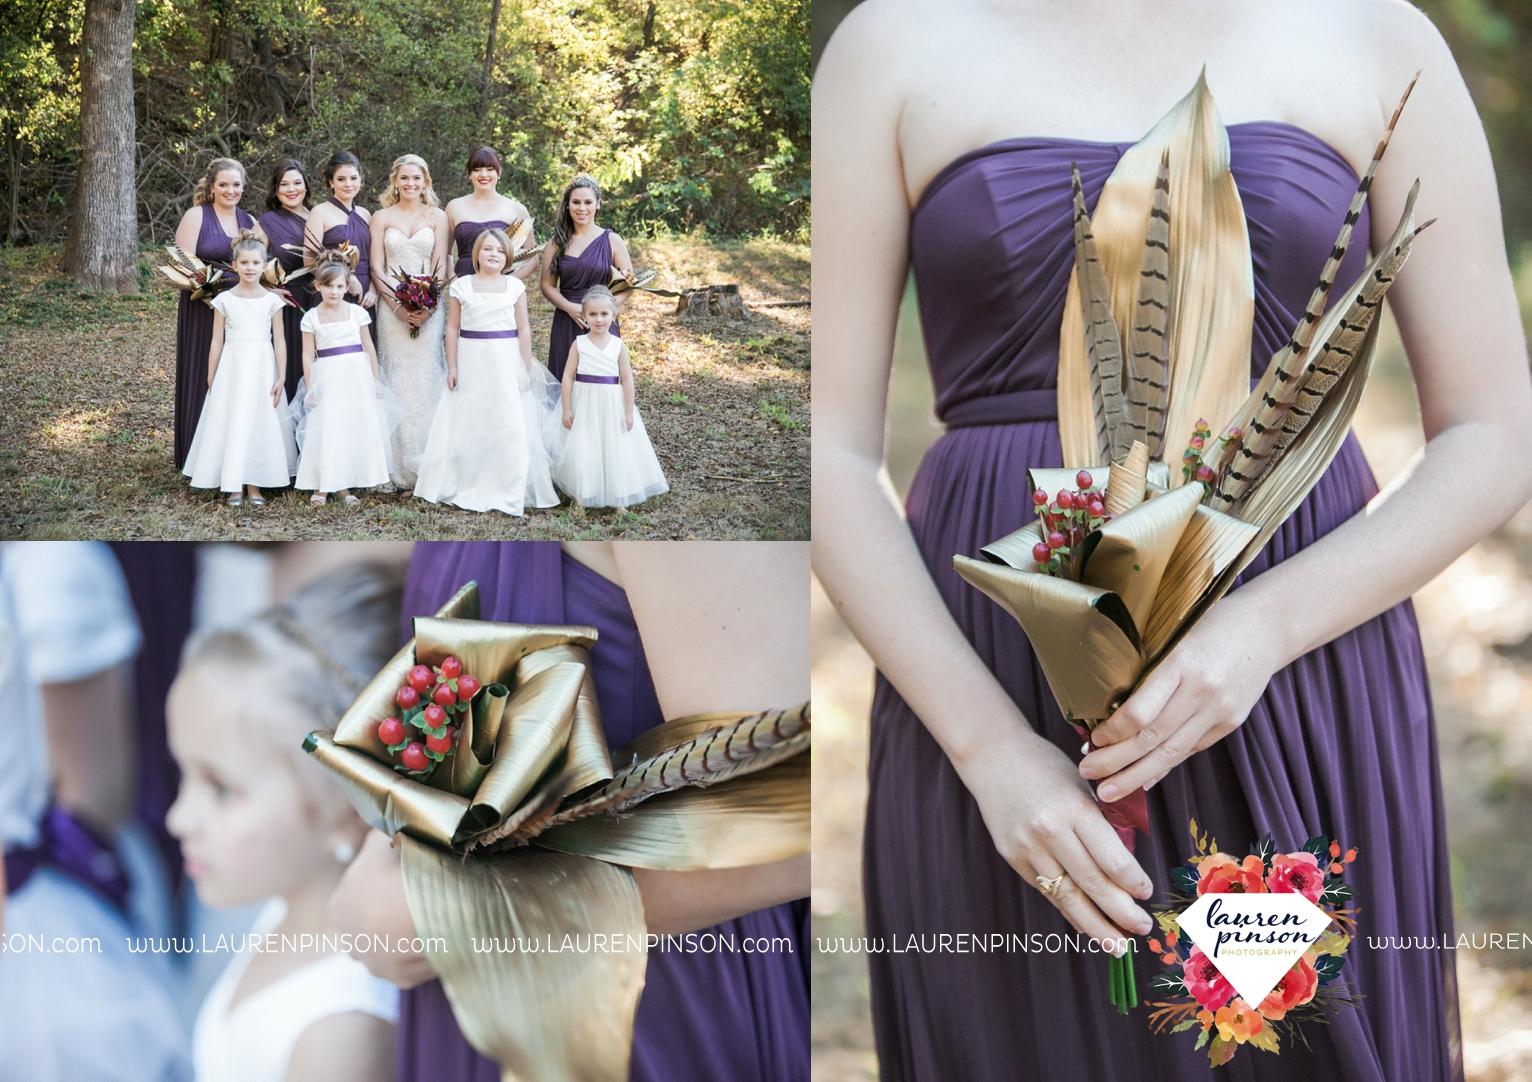 rustic-wichita-falls-texas-wedding-photographer-gold-glam-mayfield-events-market-street-united-allue-bridals-fall_1748.jpg